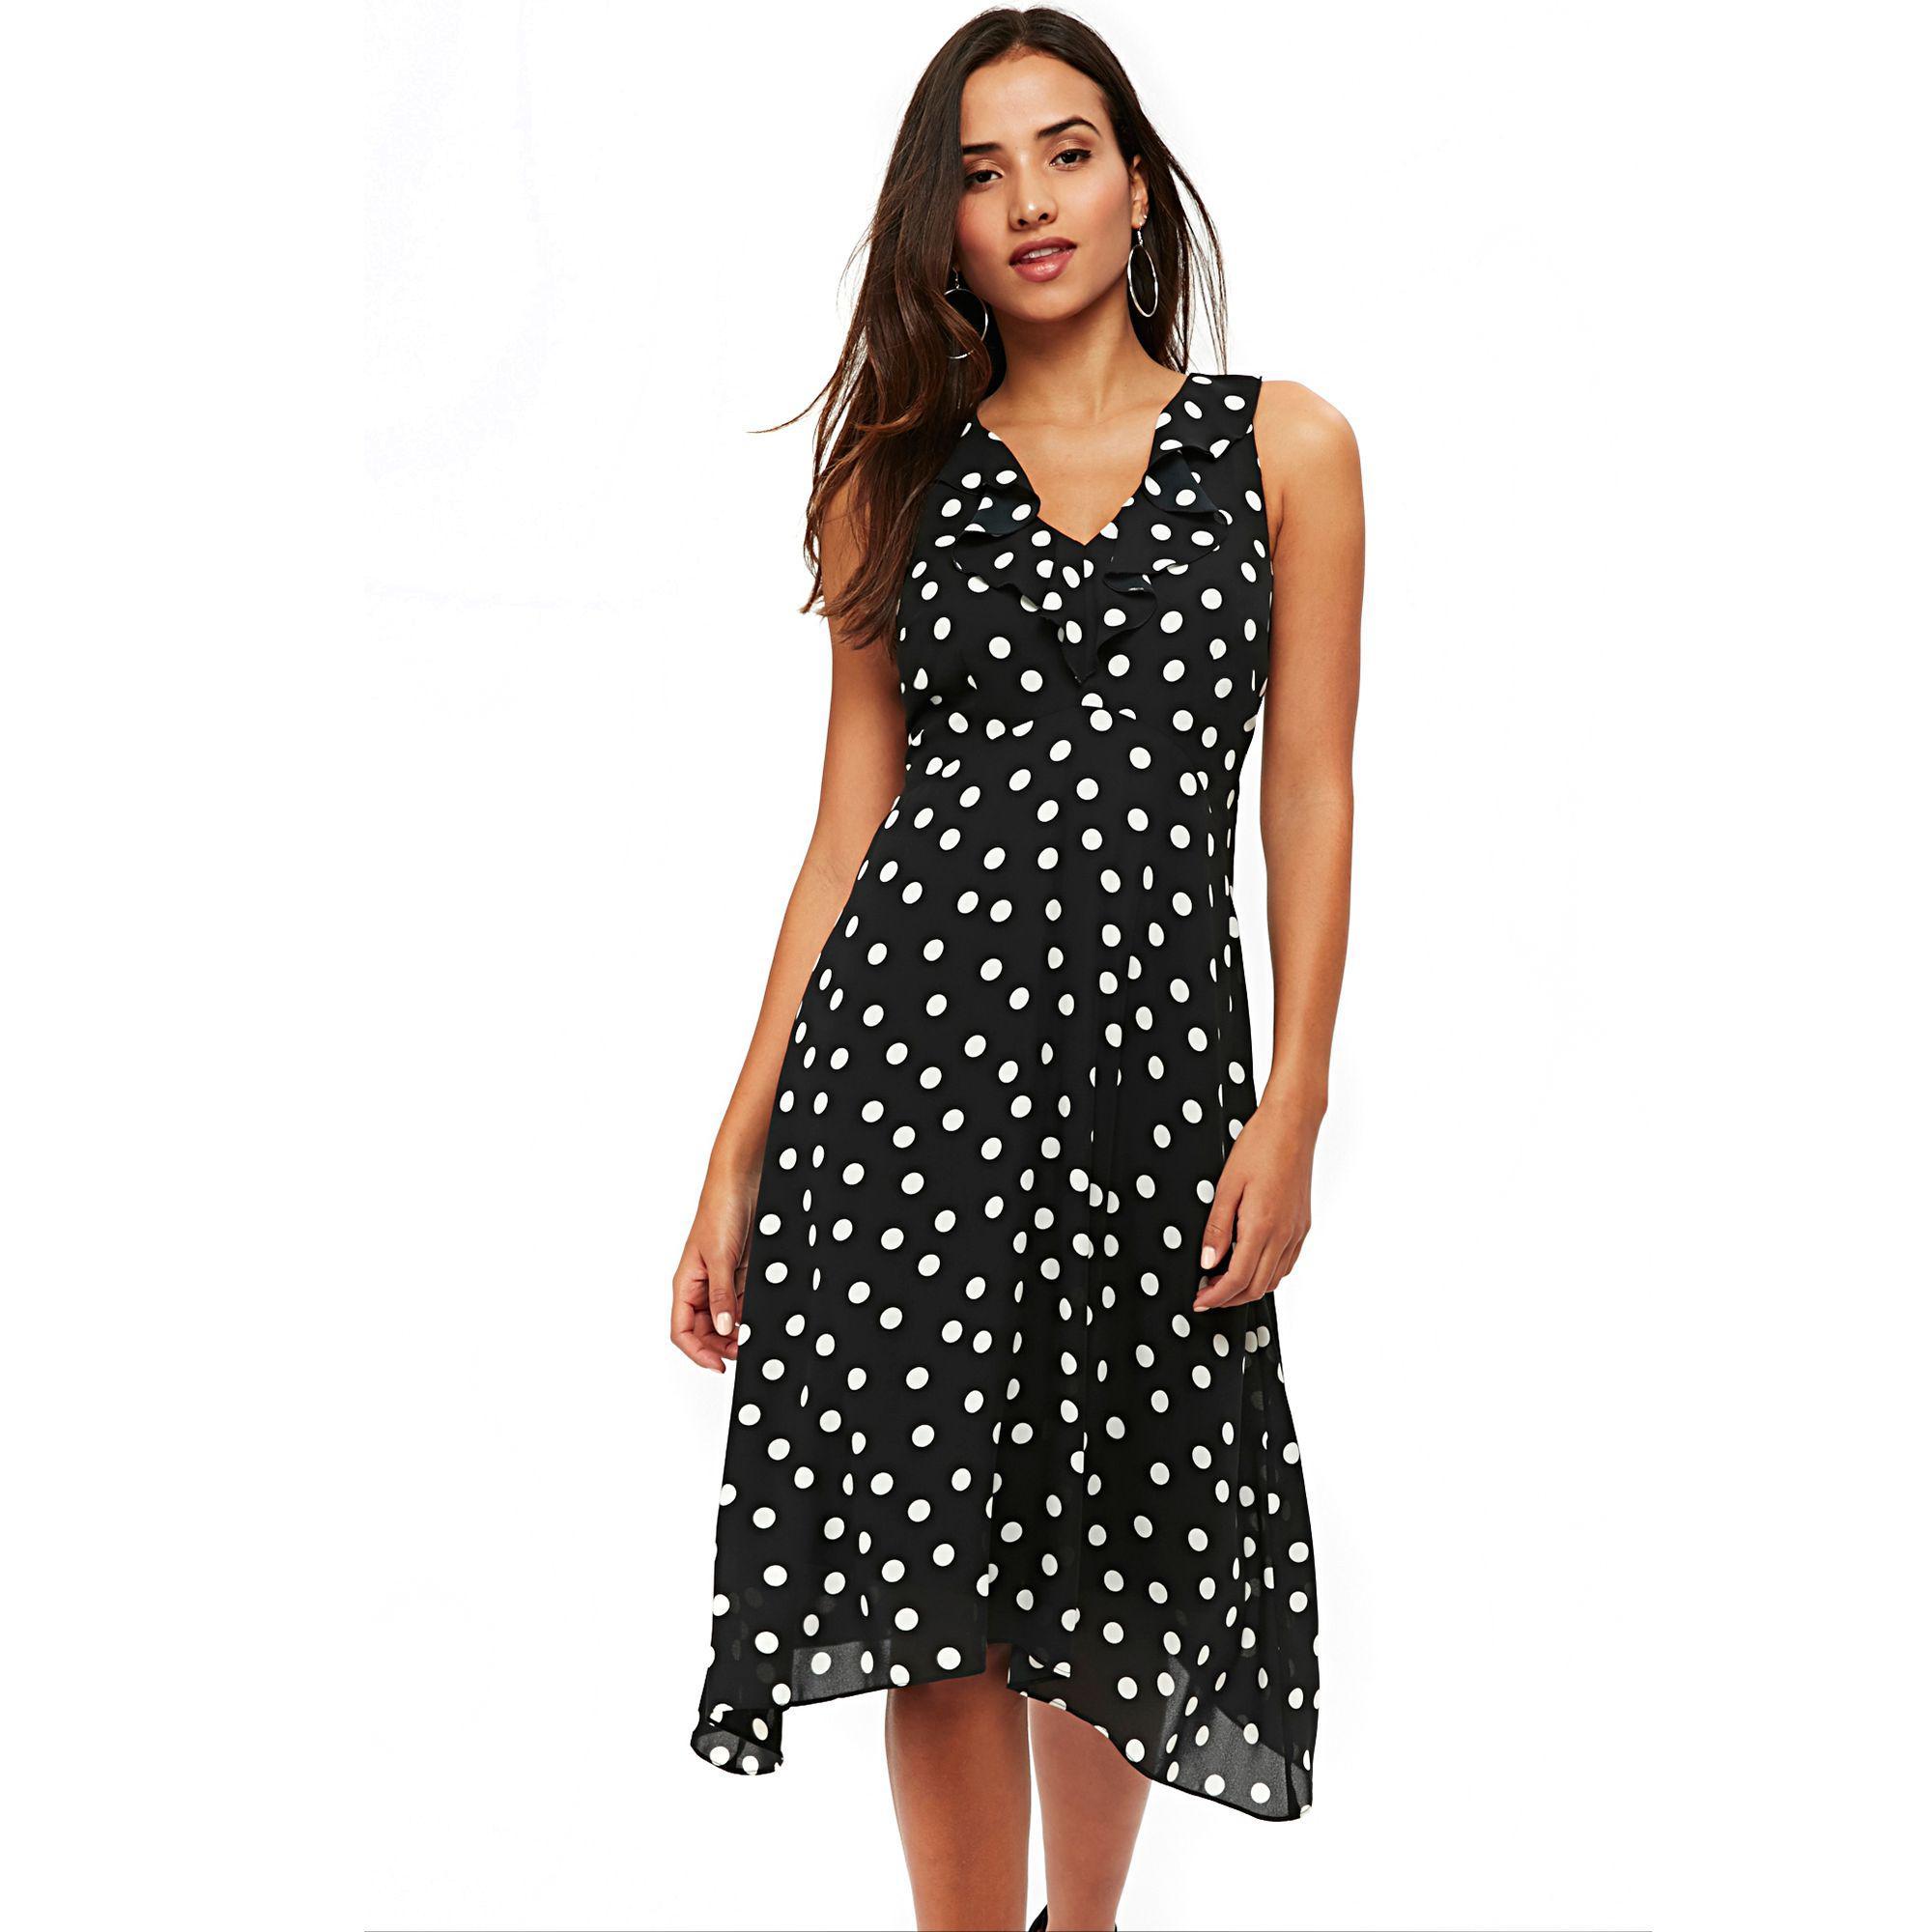 aba44b915408 Wallis Petite Black Polka Dot Midi Fit And Flare Dress in Black - Lyst